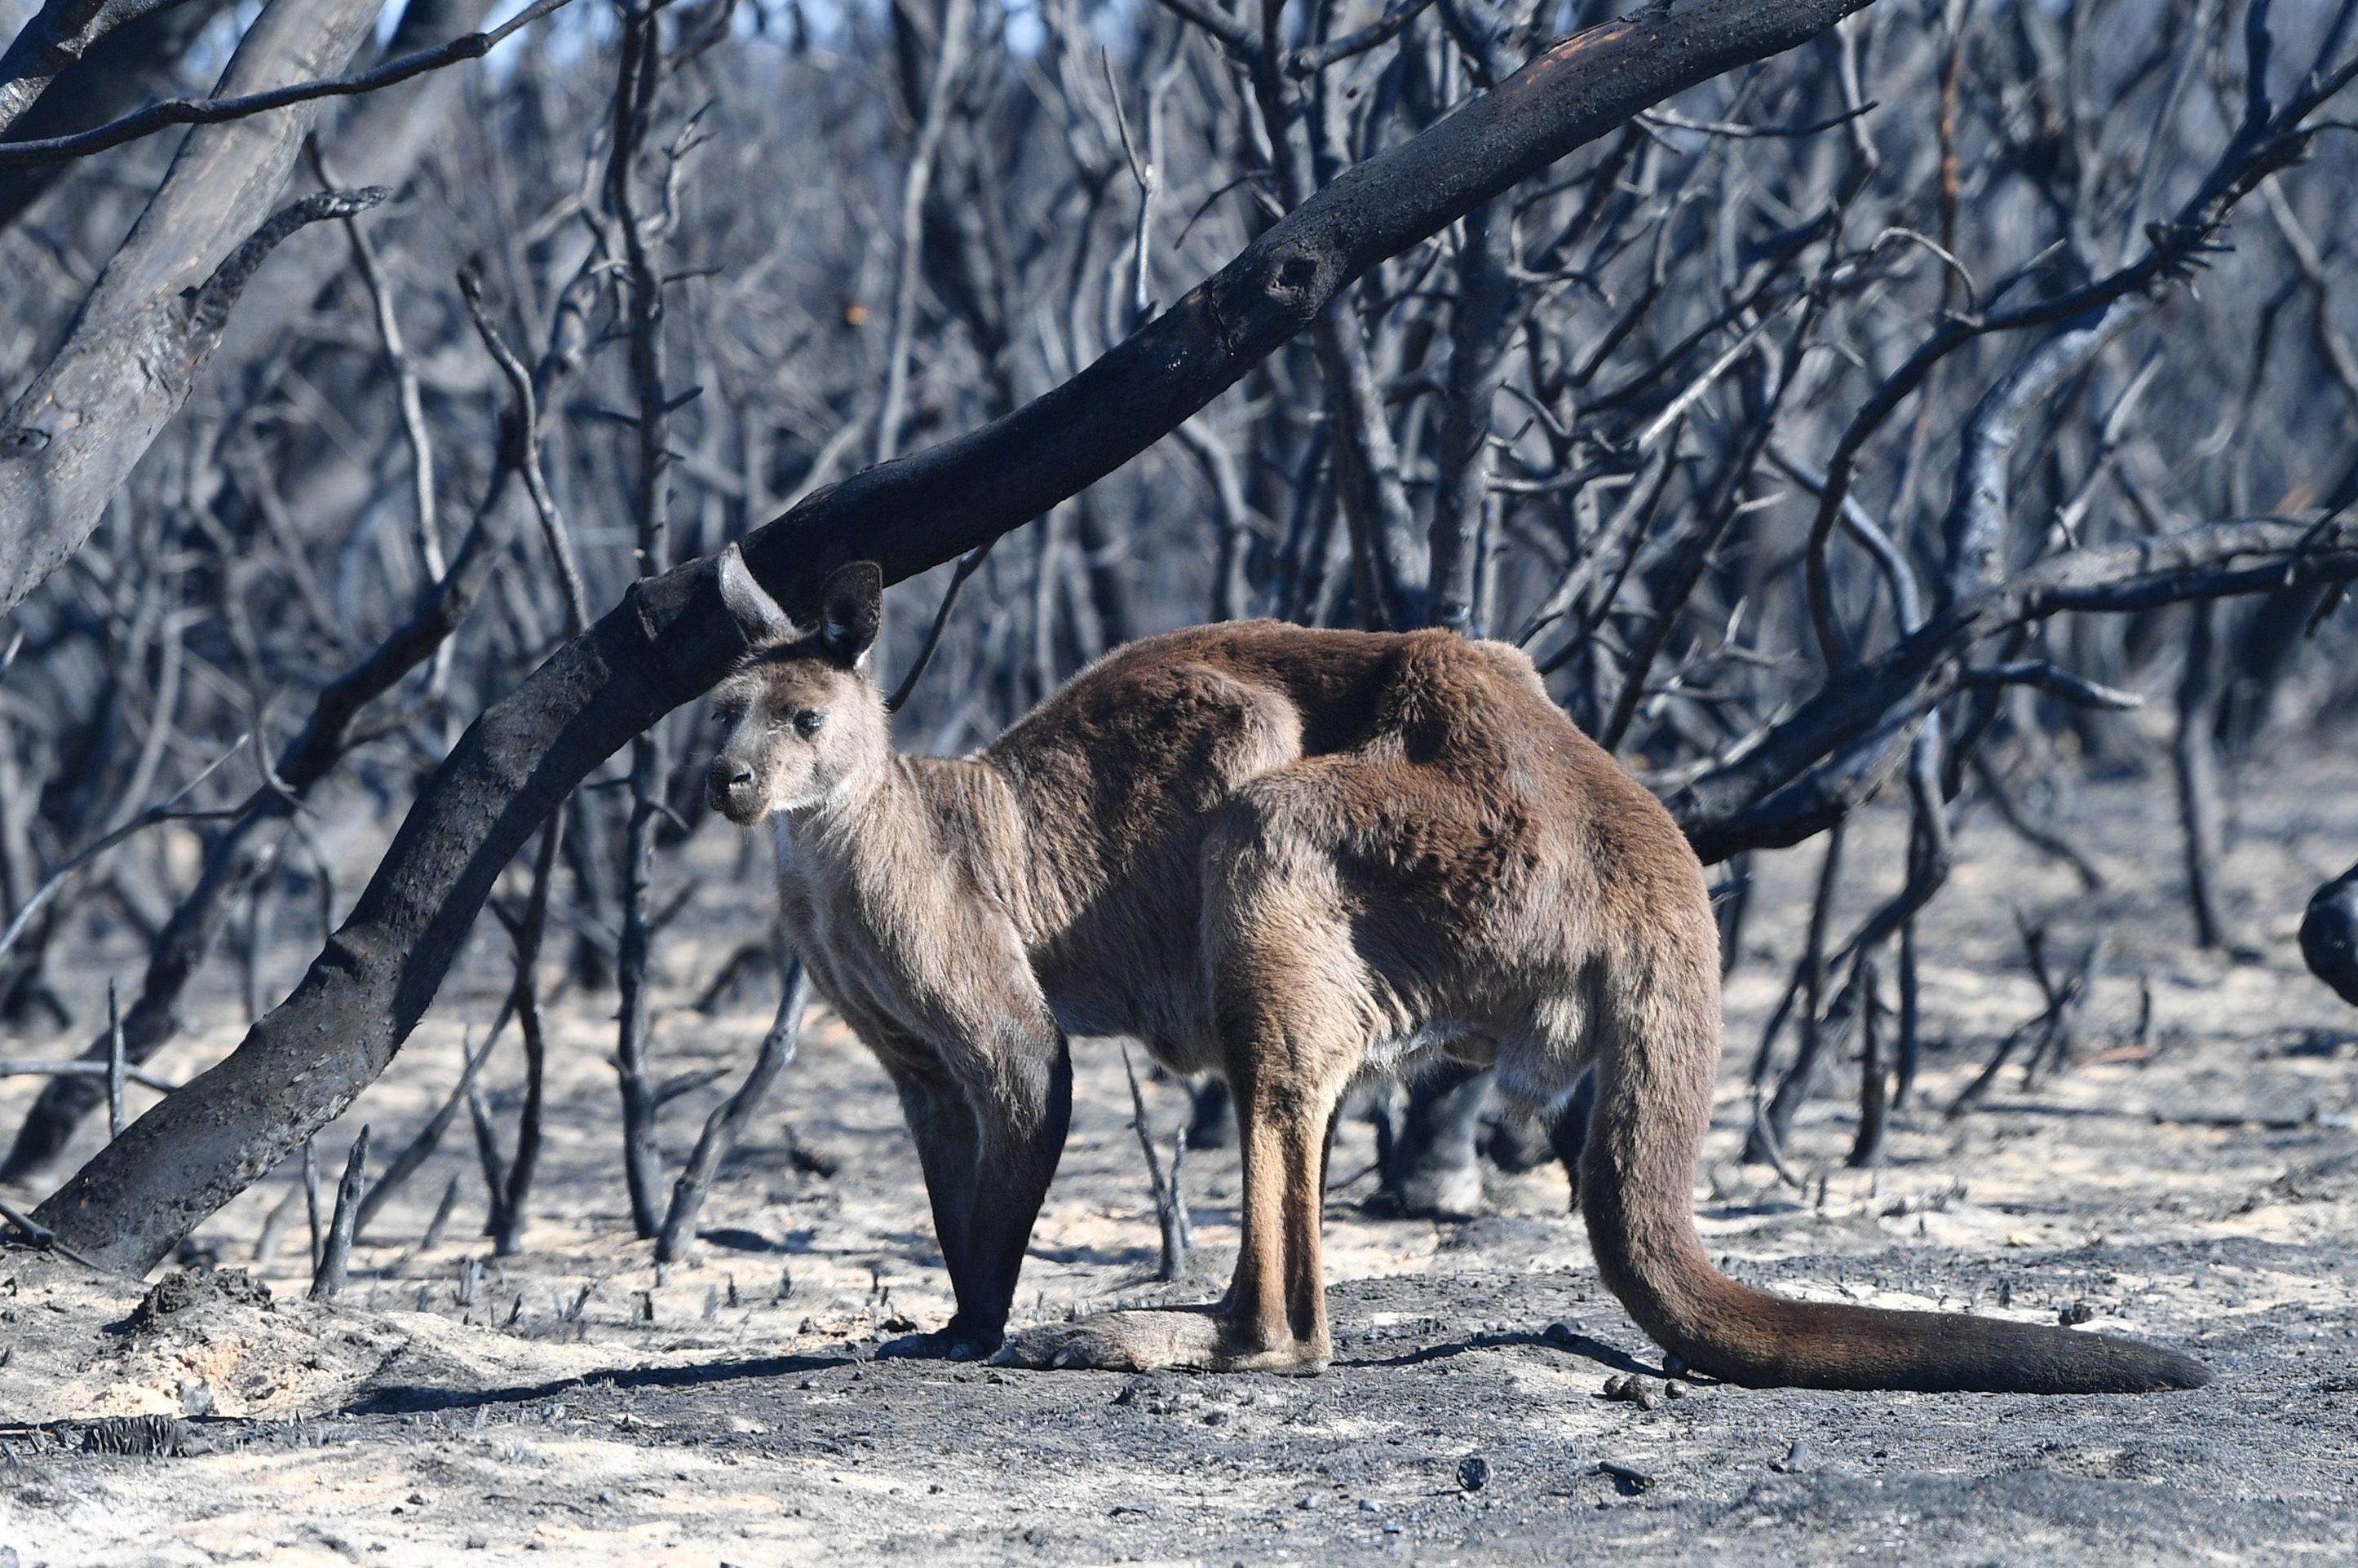 A kangaroo is seen at the Flinder Chase National Park during bushfires on Kangaroo Island, Australia, 07 January 2020.